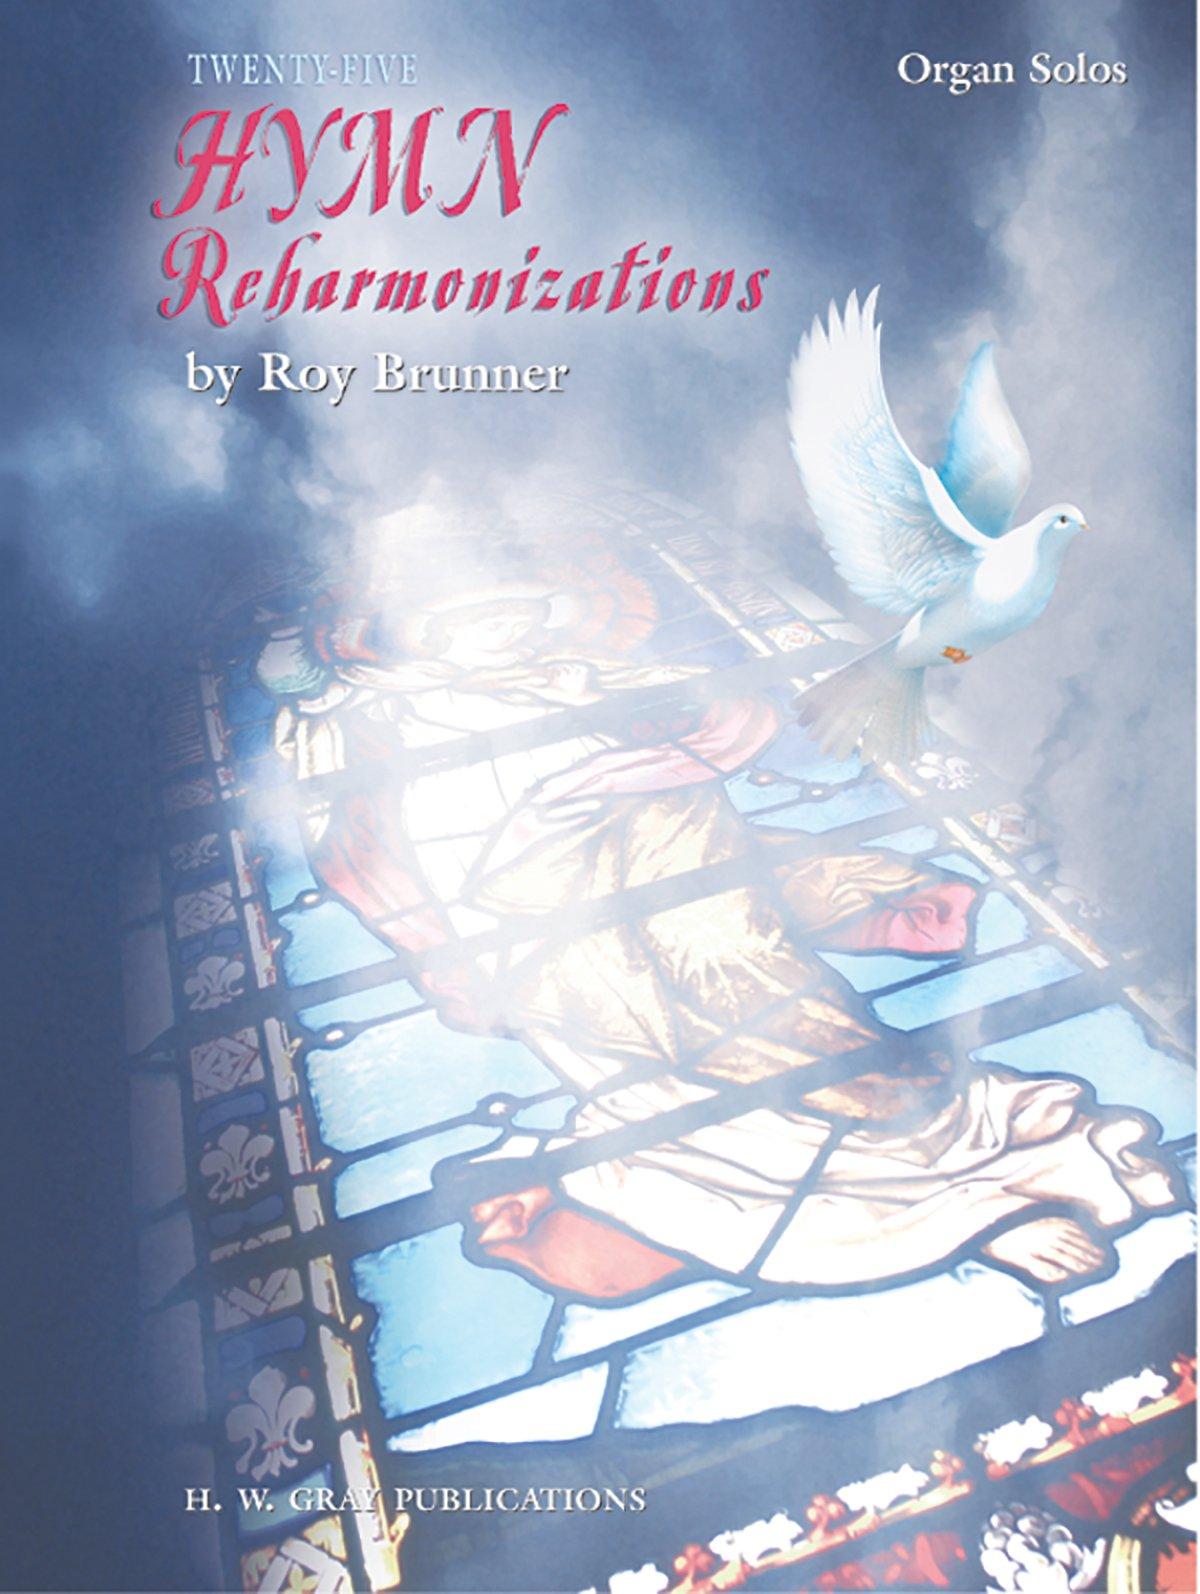 Twenty-Five Hymn Reharmonizations (H. W. Gray) PDF